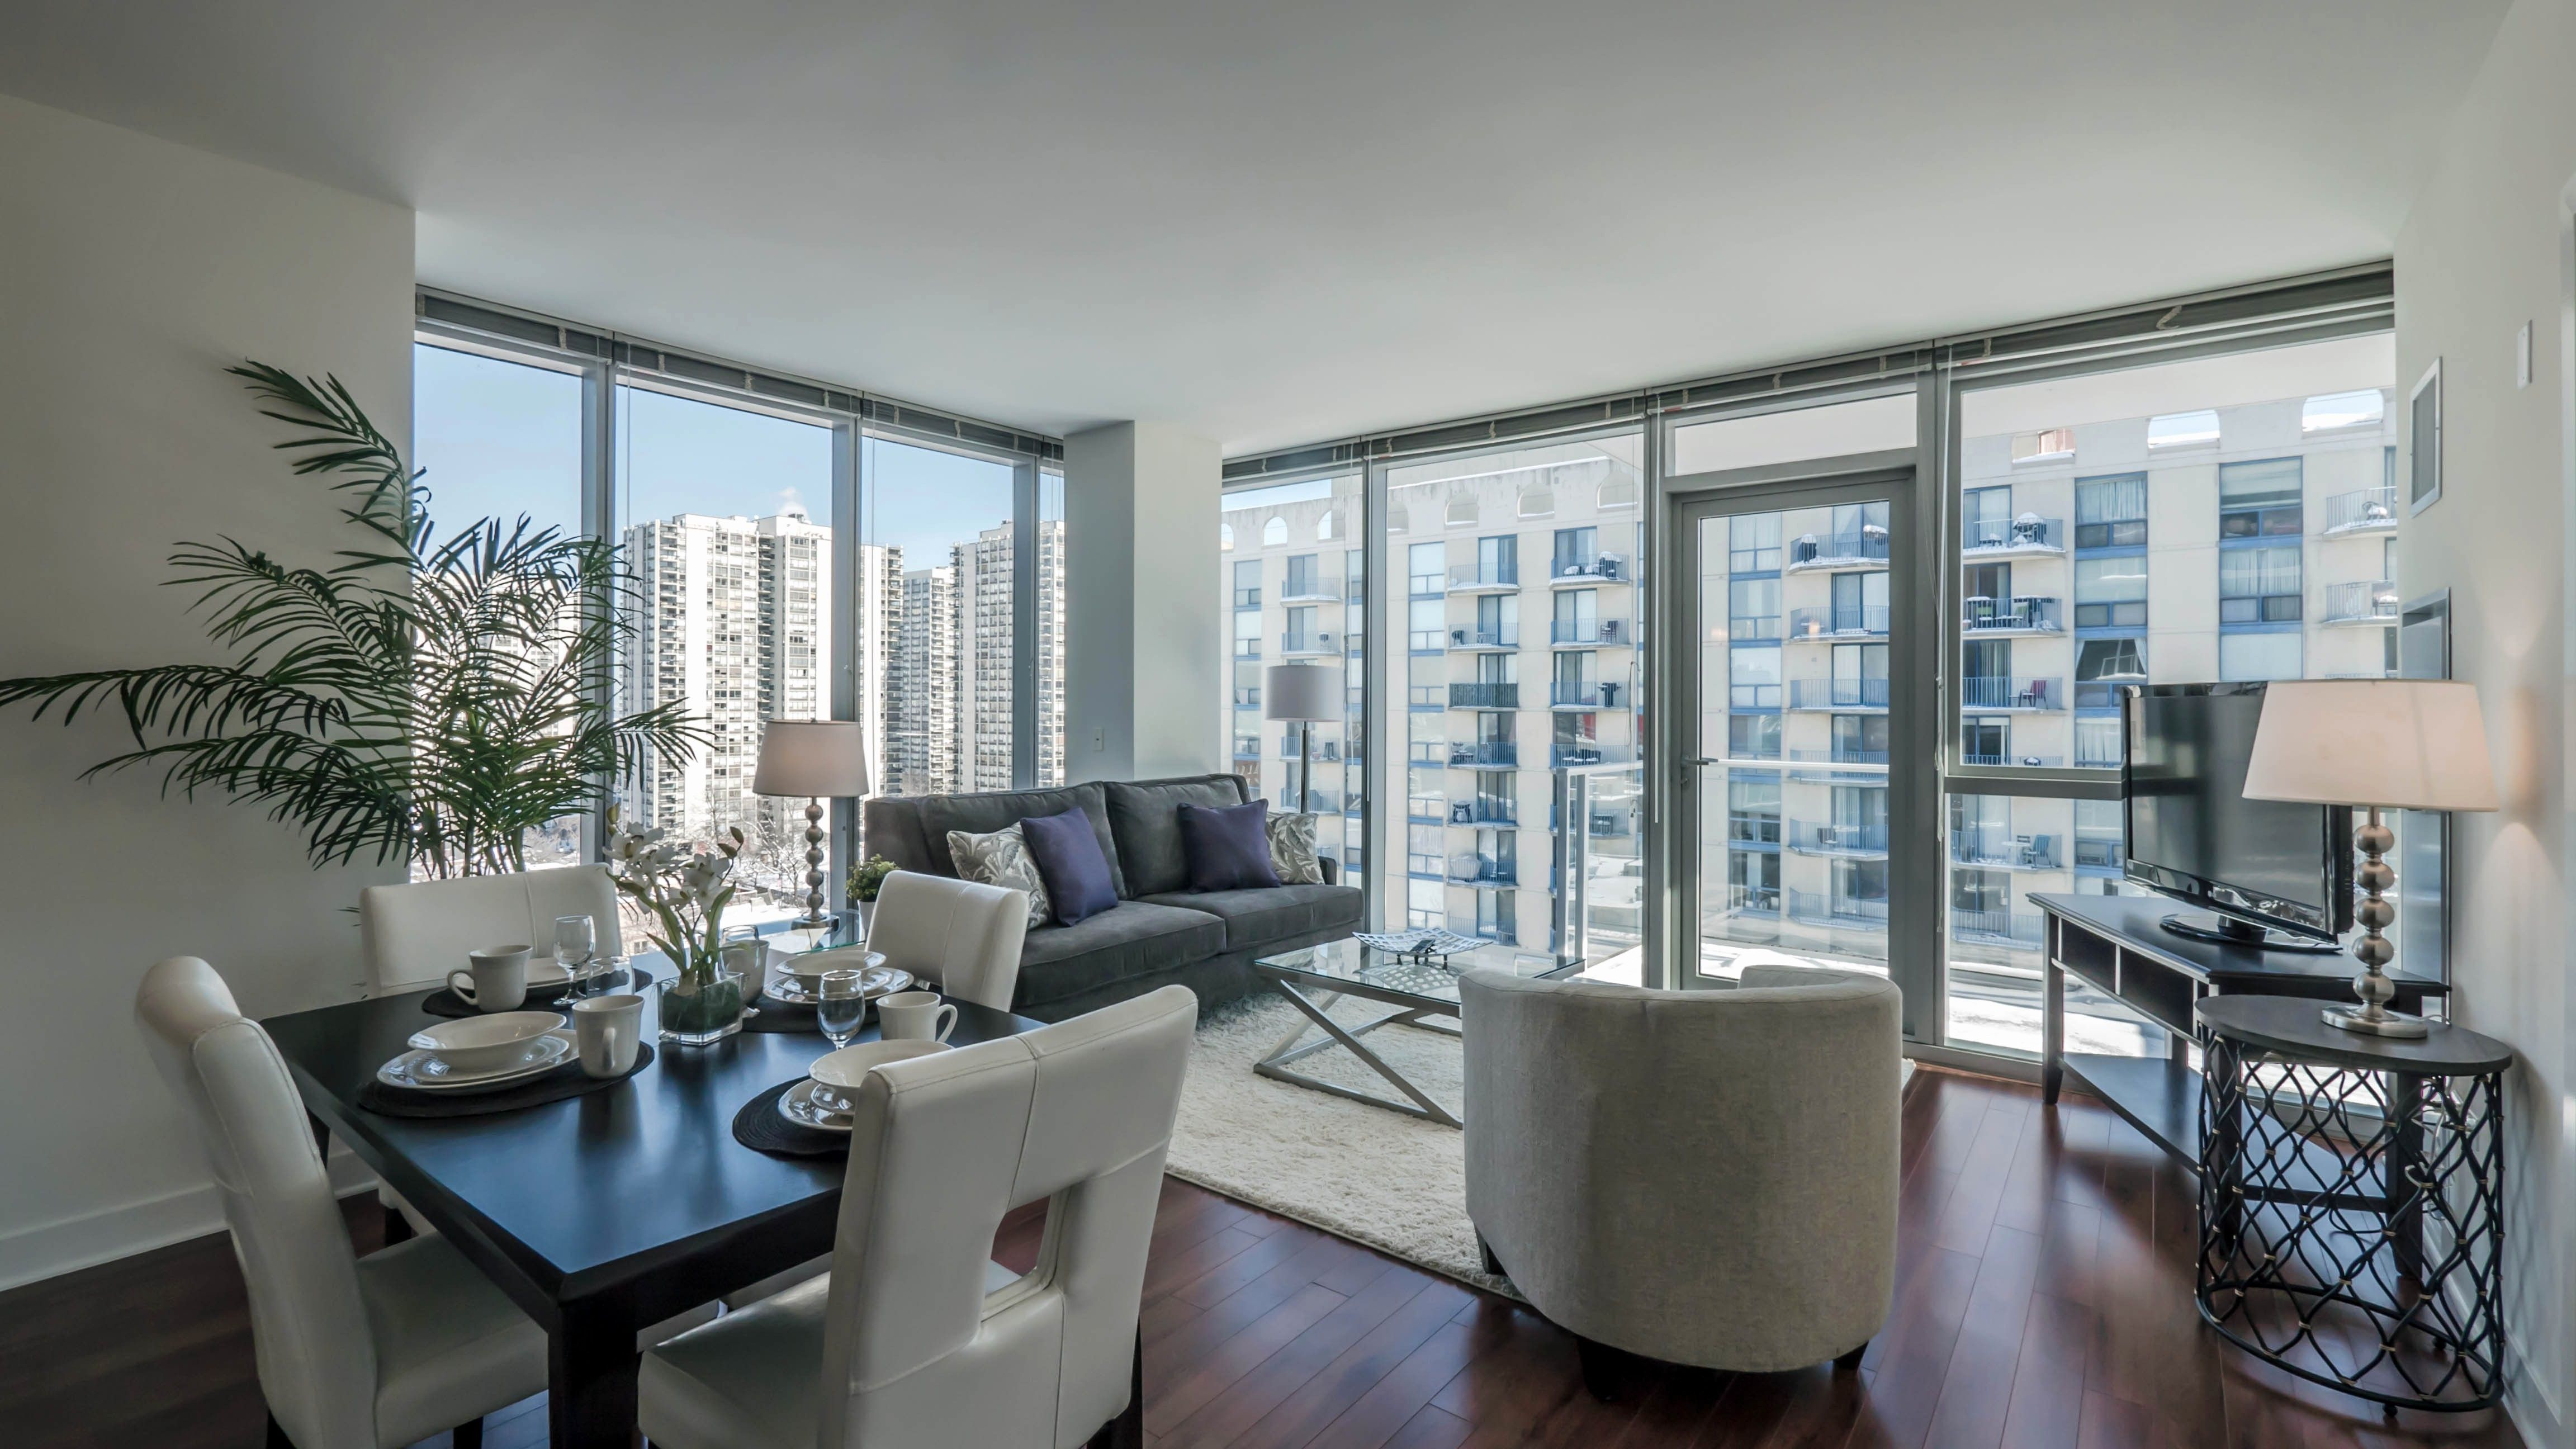 20 Lovely Bedroom Apartment Gold Coast Design Renting A House One Bedroom Apartment Apartments For Rent